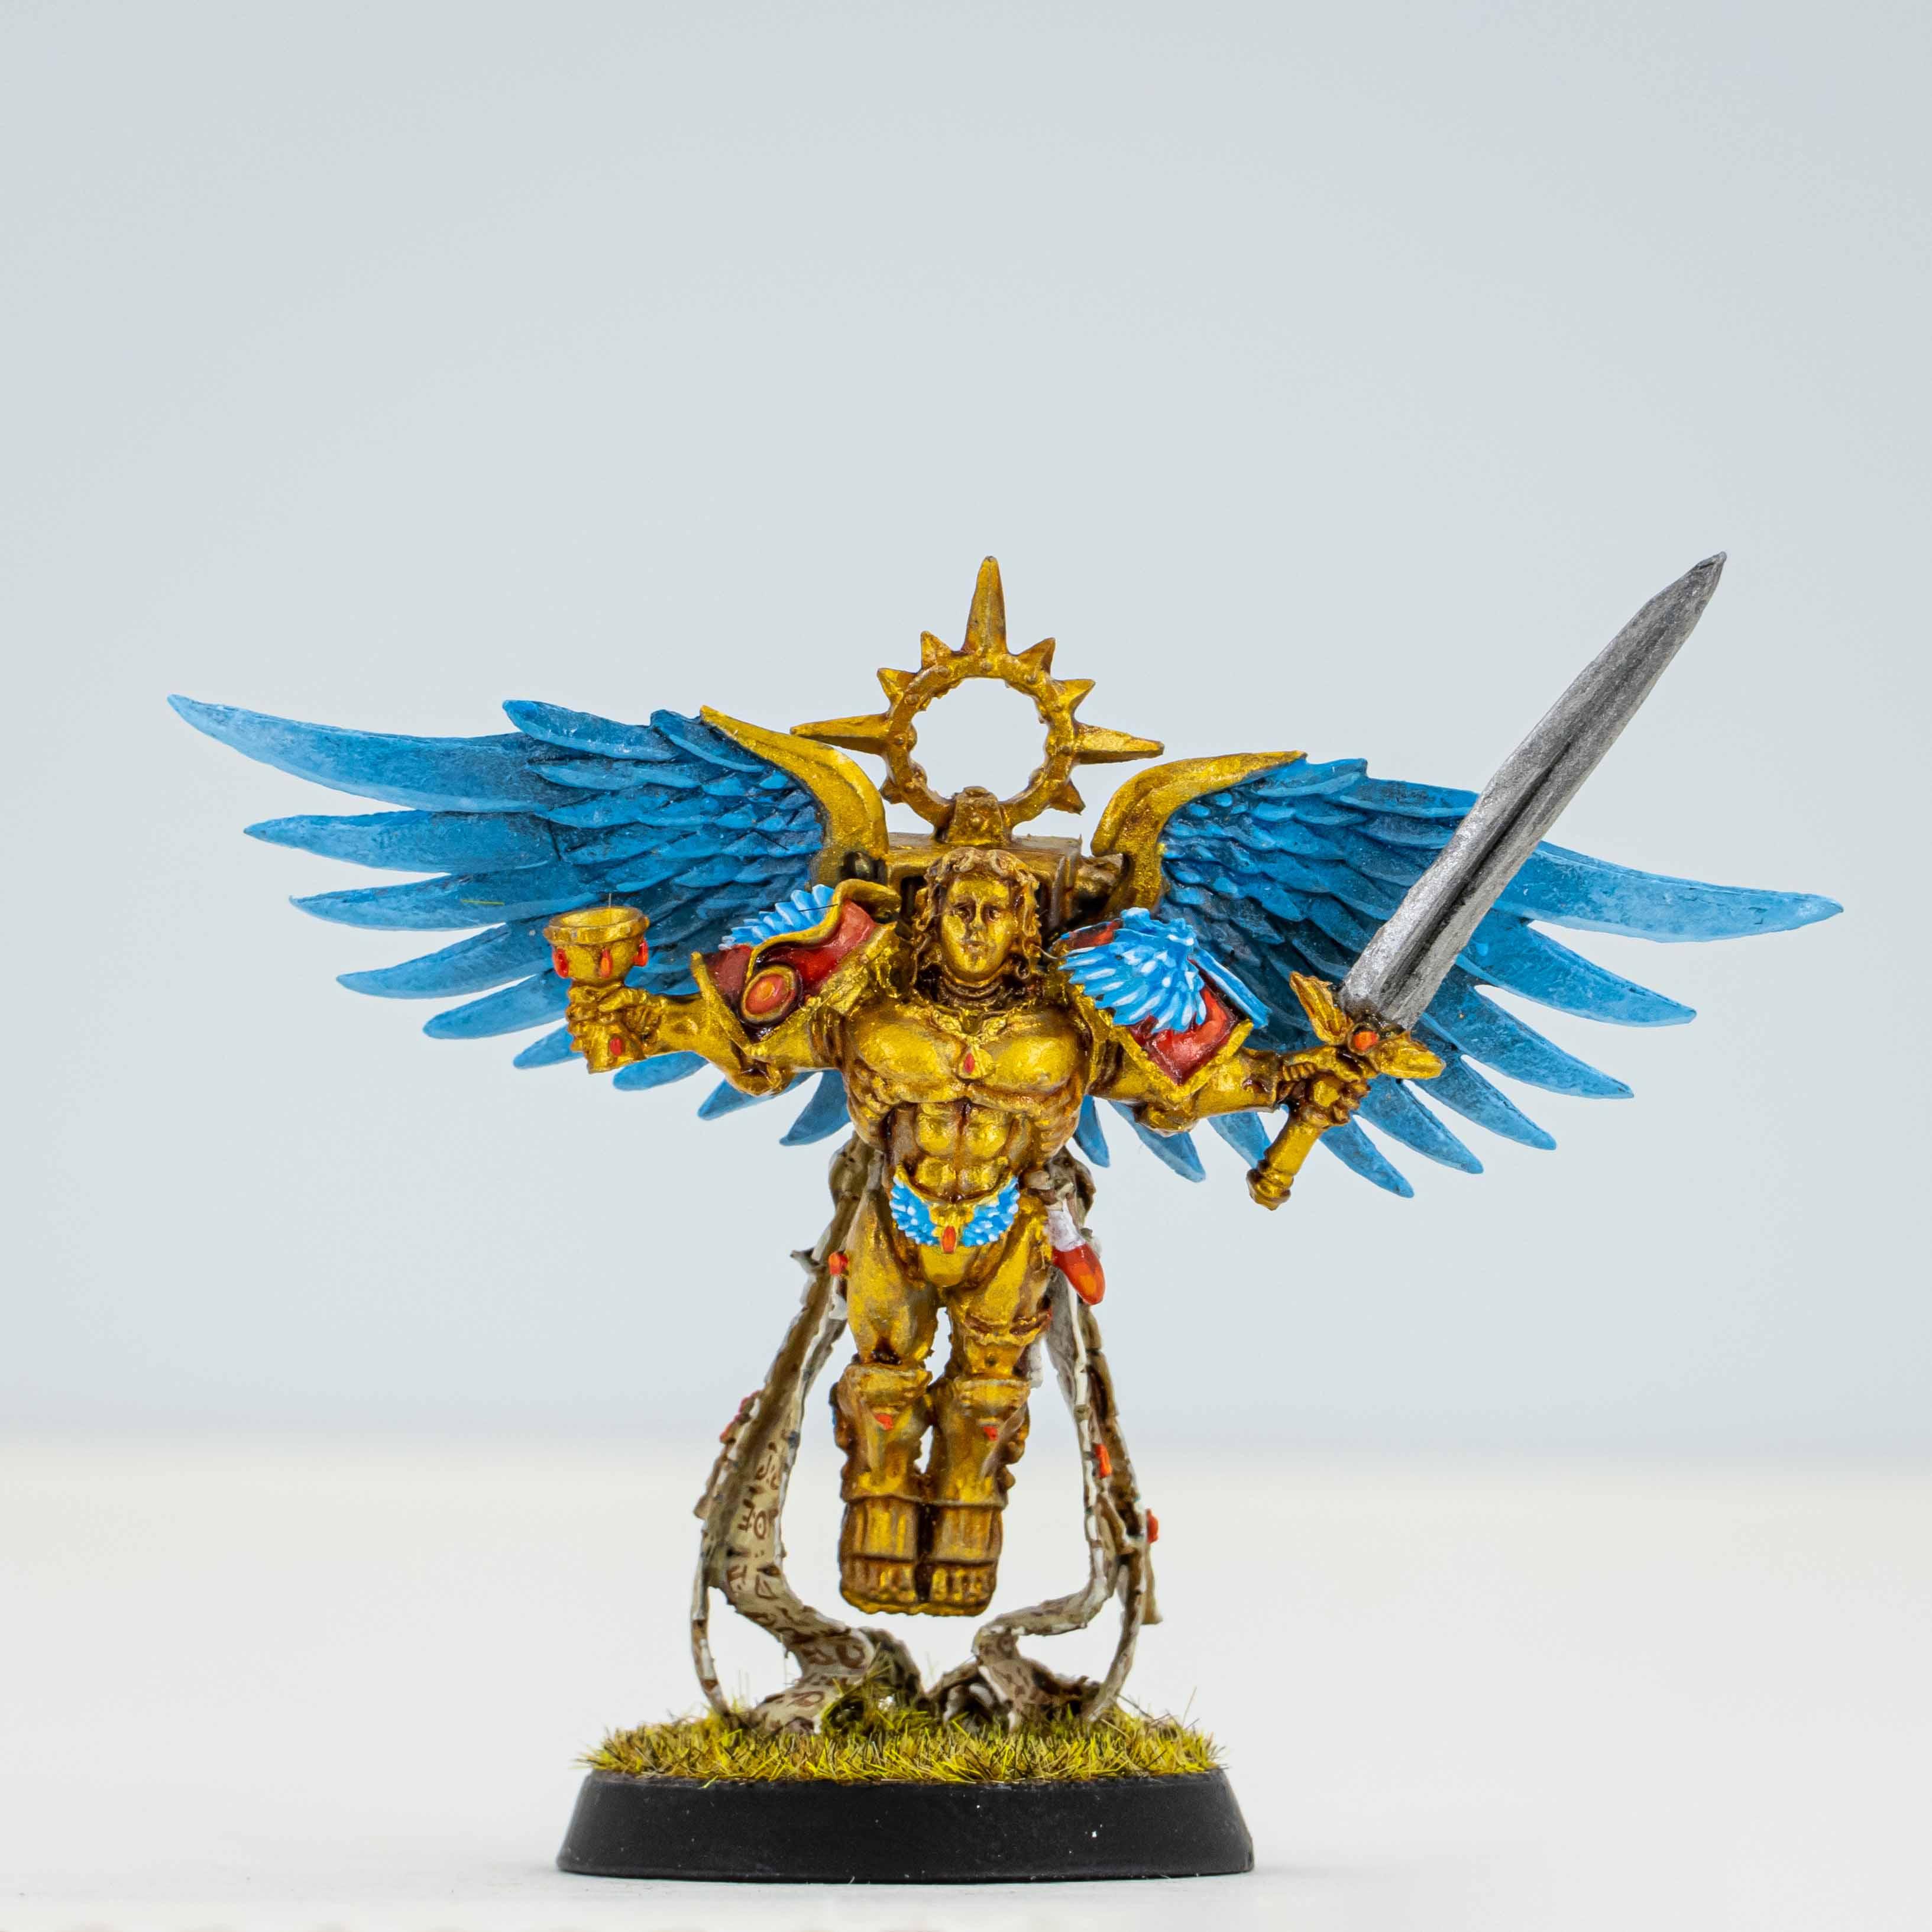 Sanguinor, Exemplar of the Host